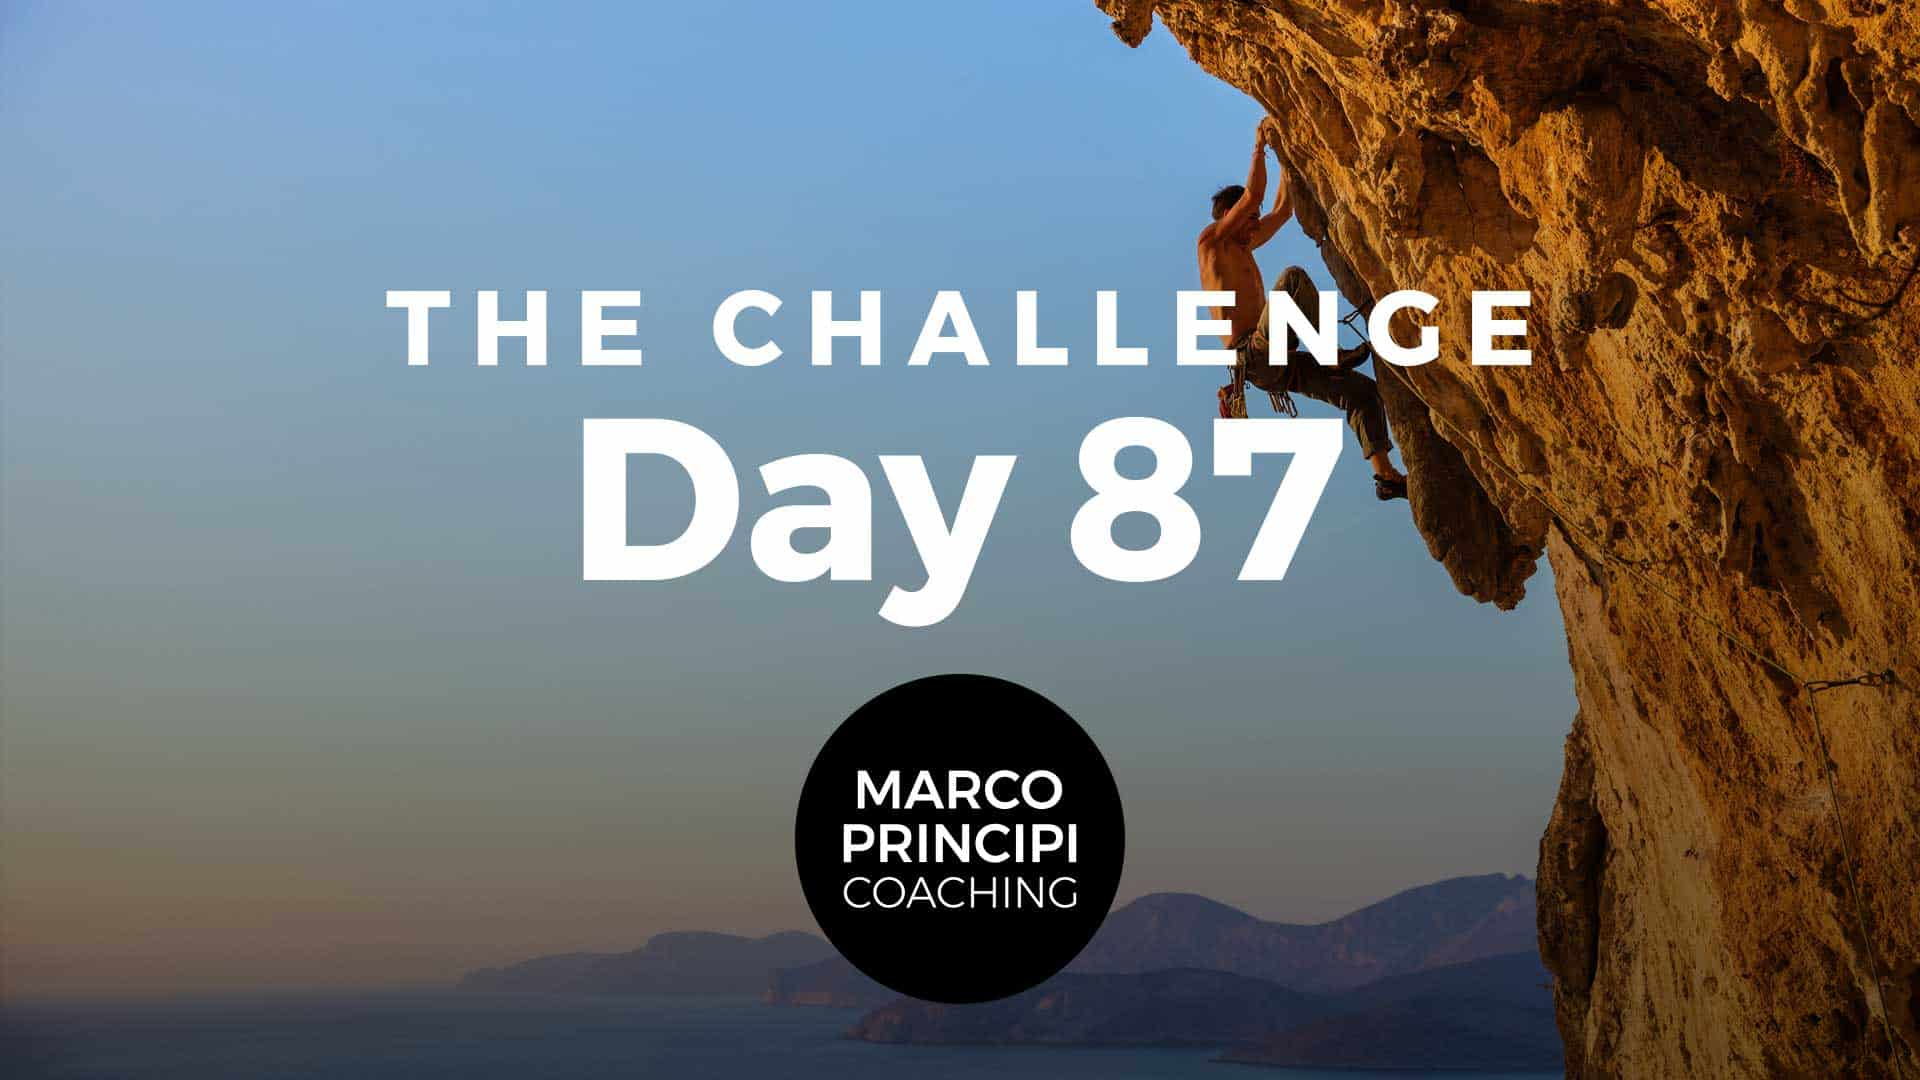 Marco Principi Coaching Challenge Day 87